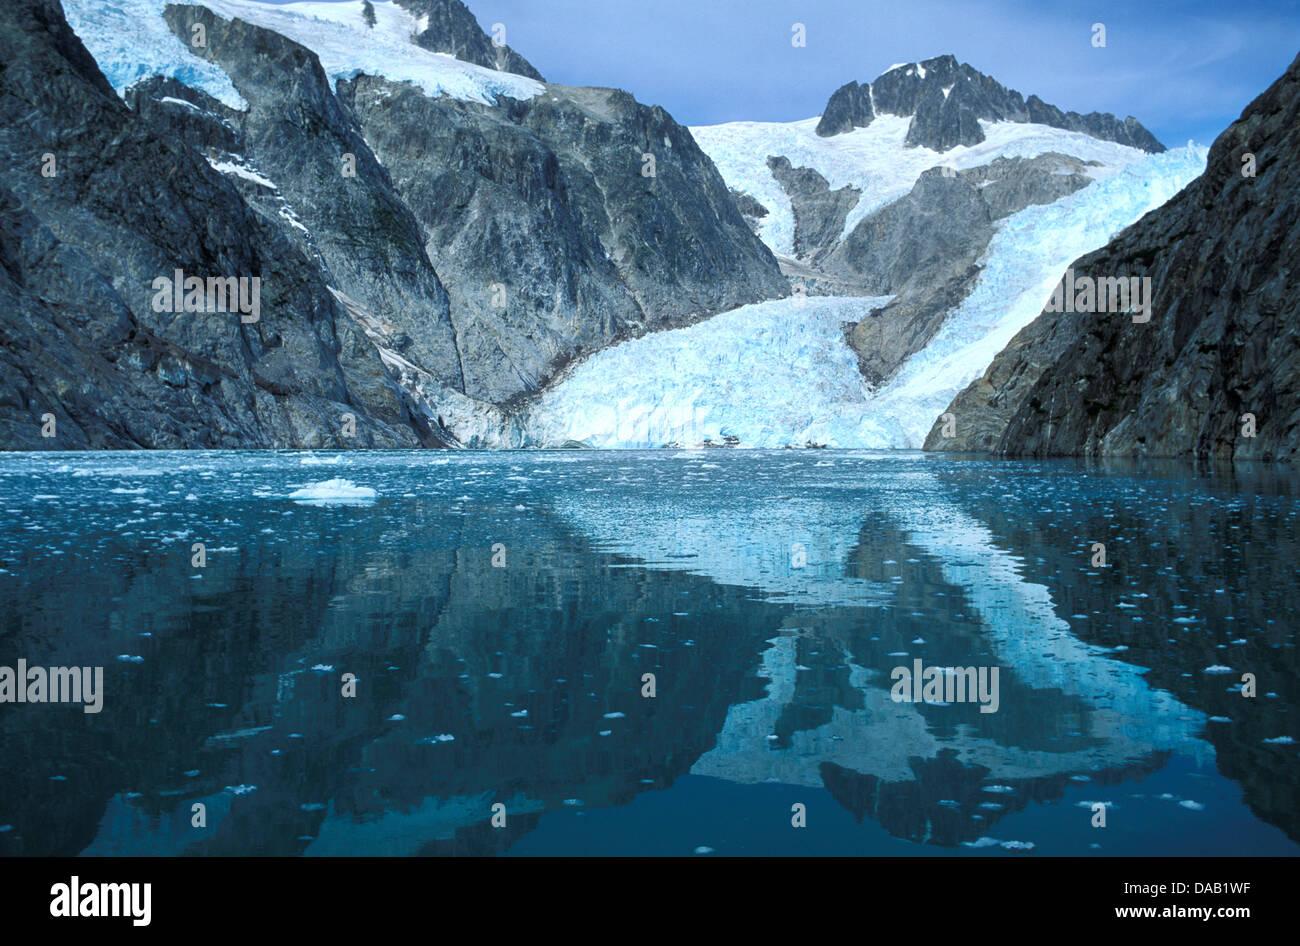 Northwestern Glacier, Kenai Fjords, National Park, Alaska, USA, ice, snow, cold, rocks, mountains, reflections, Stock Photo